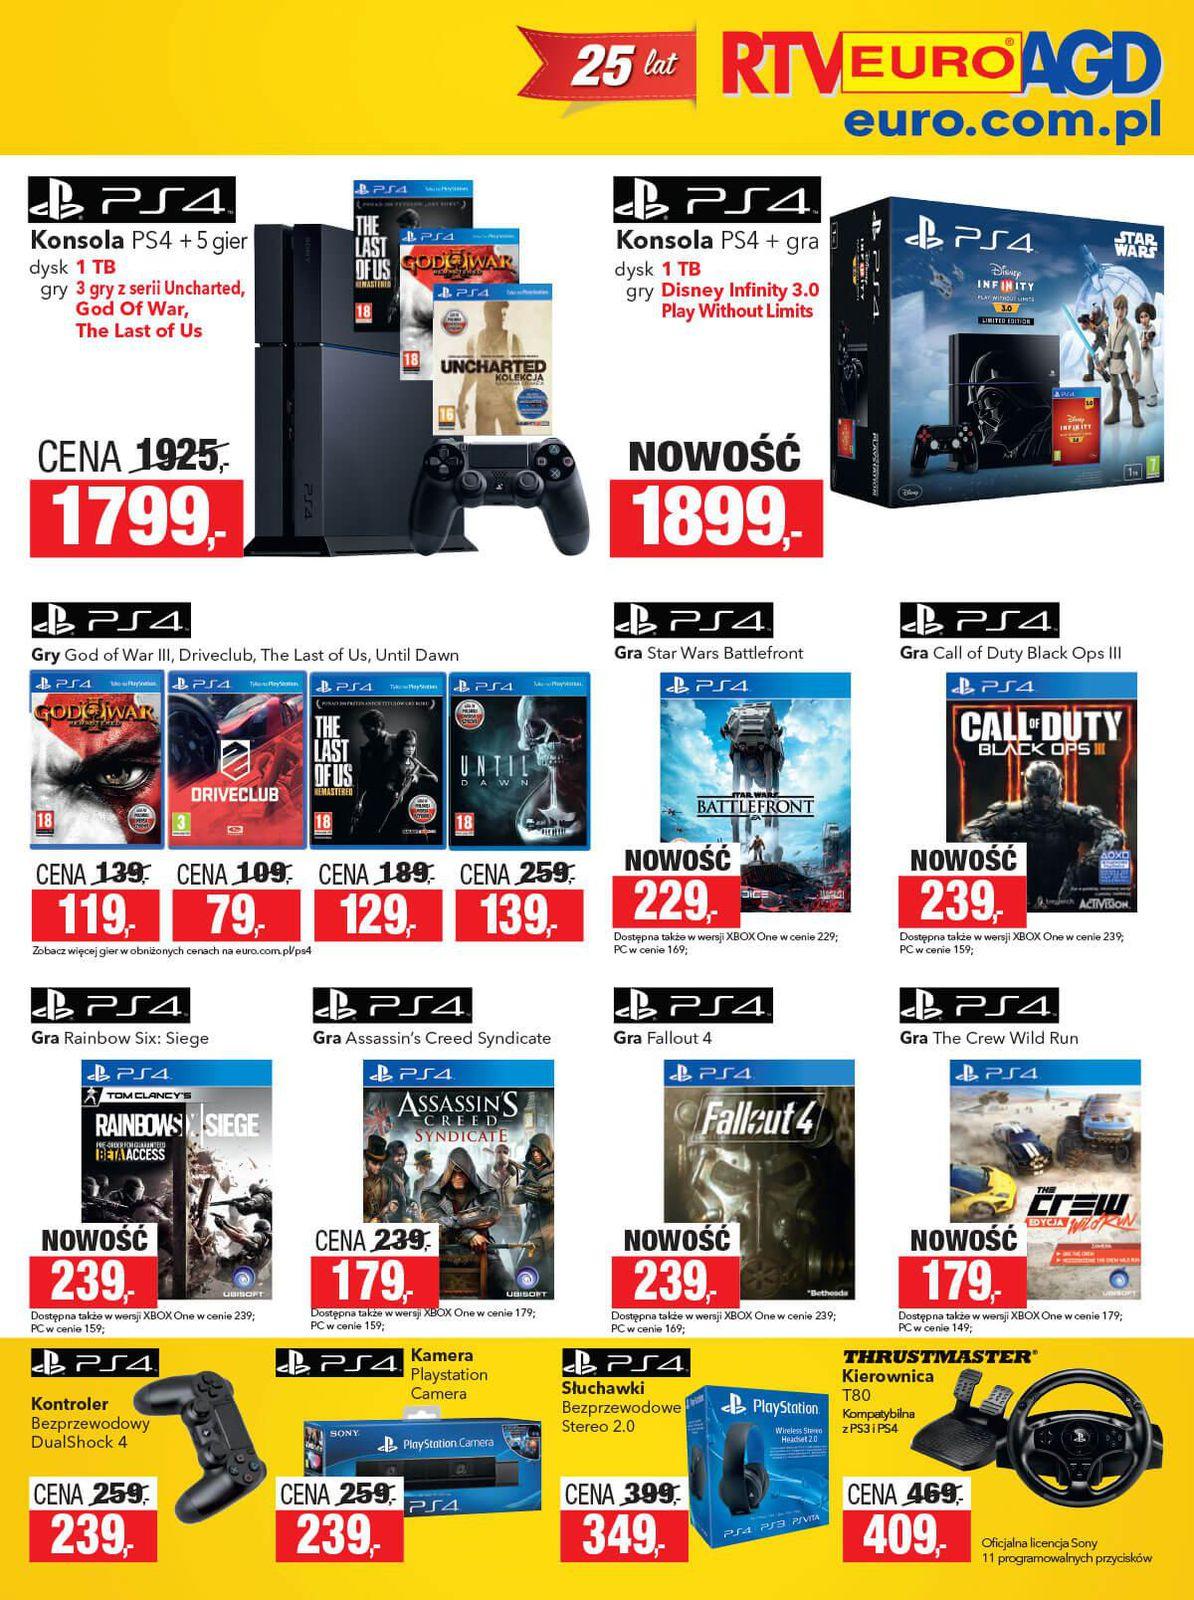 Gazetka promocyjna RTV Euro AGD do 31/12/2015 str.10